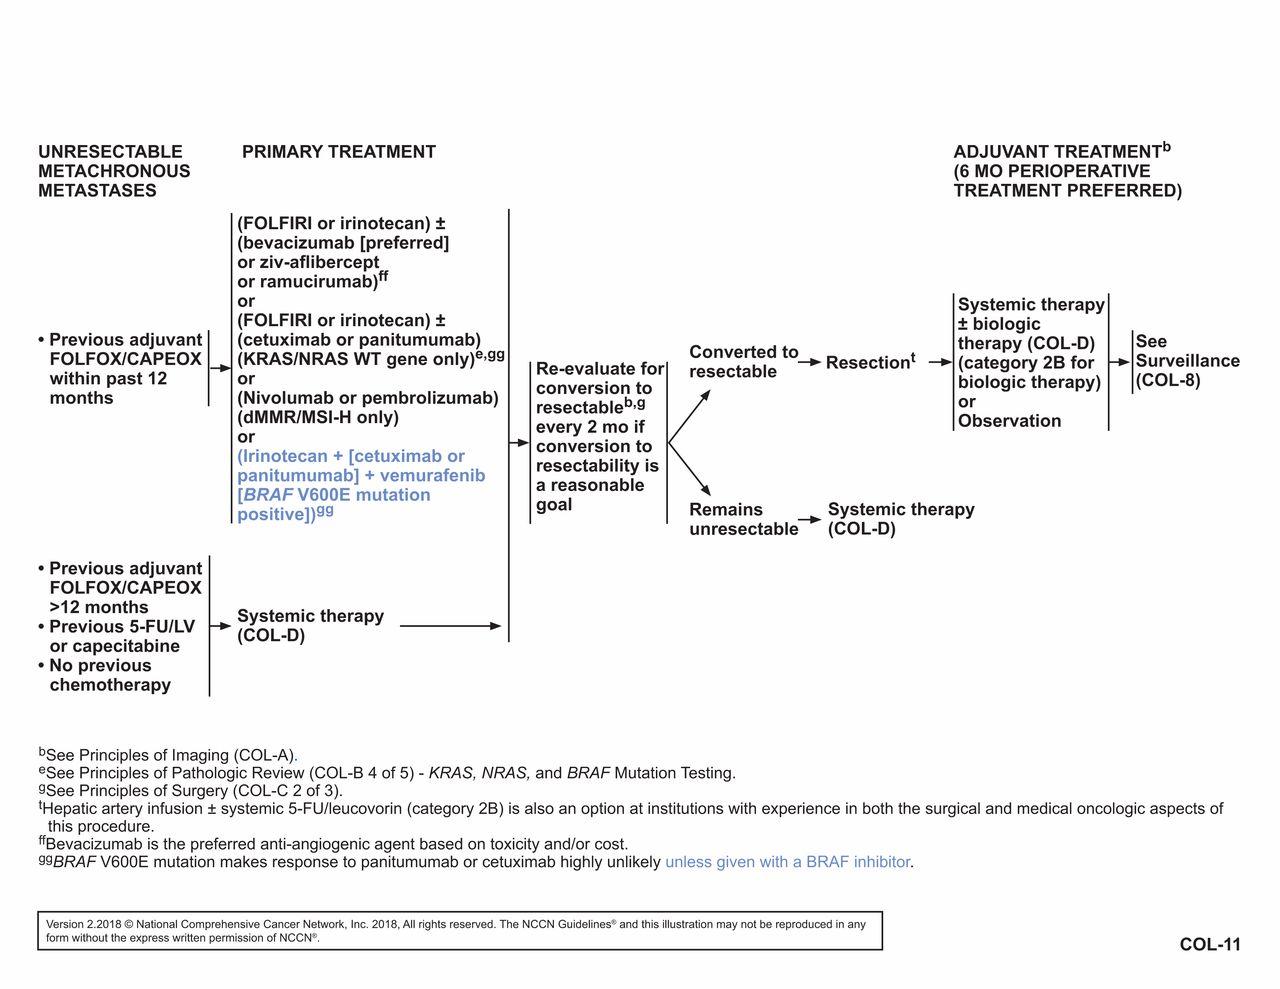 colorectal cancer guideline